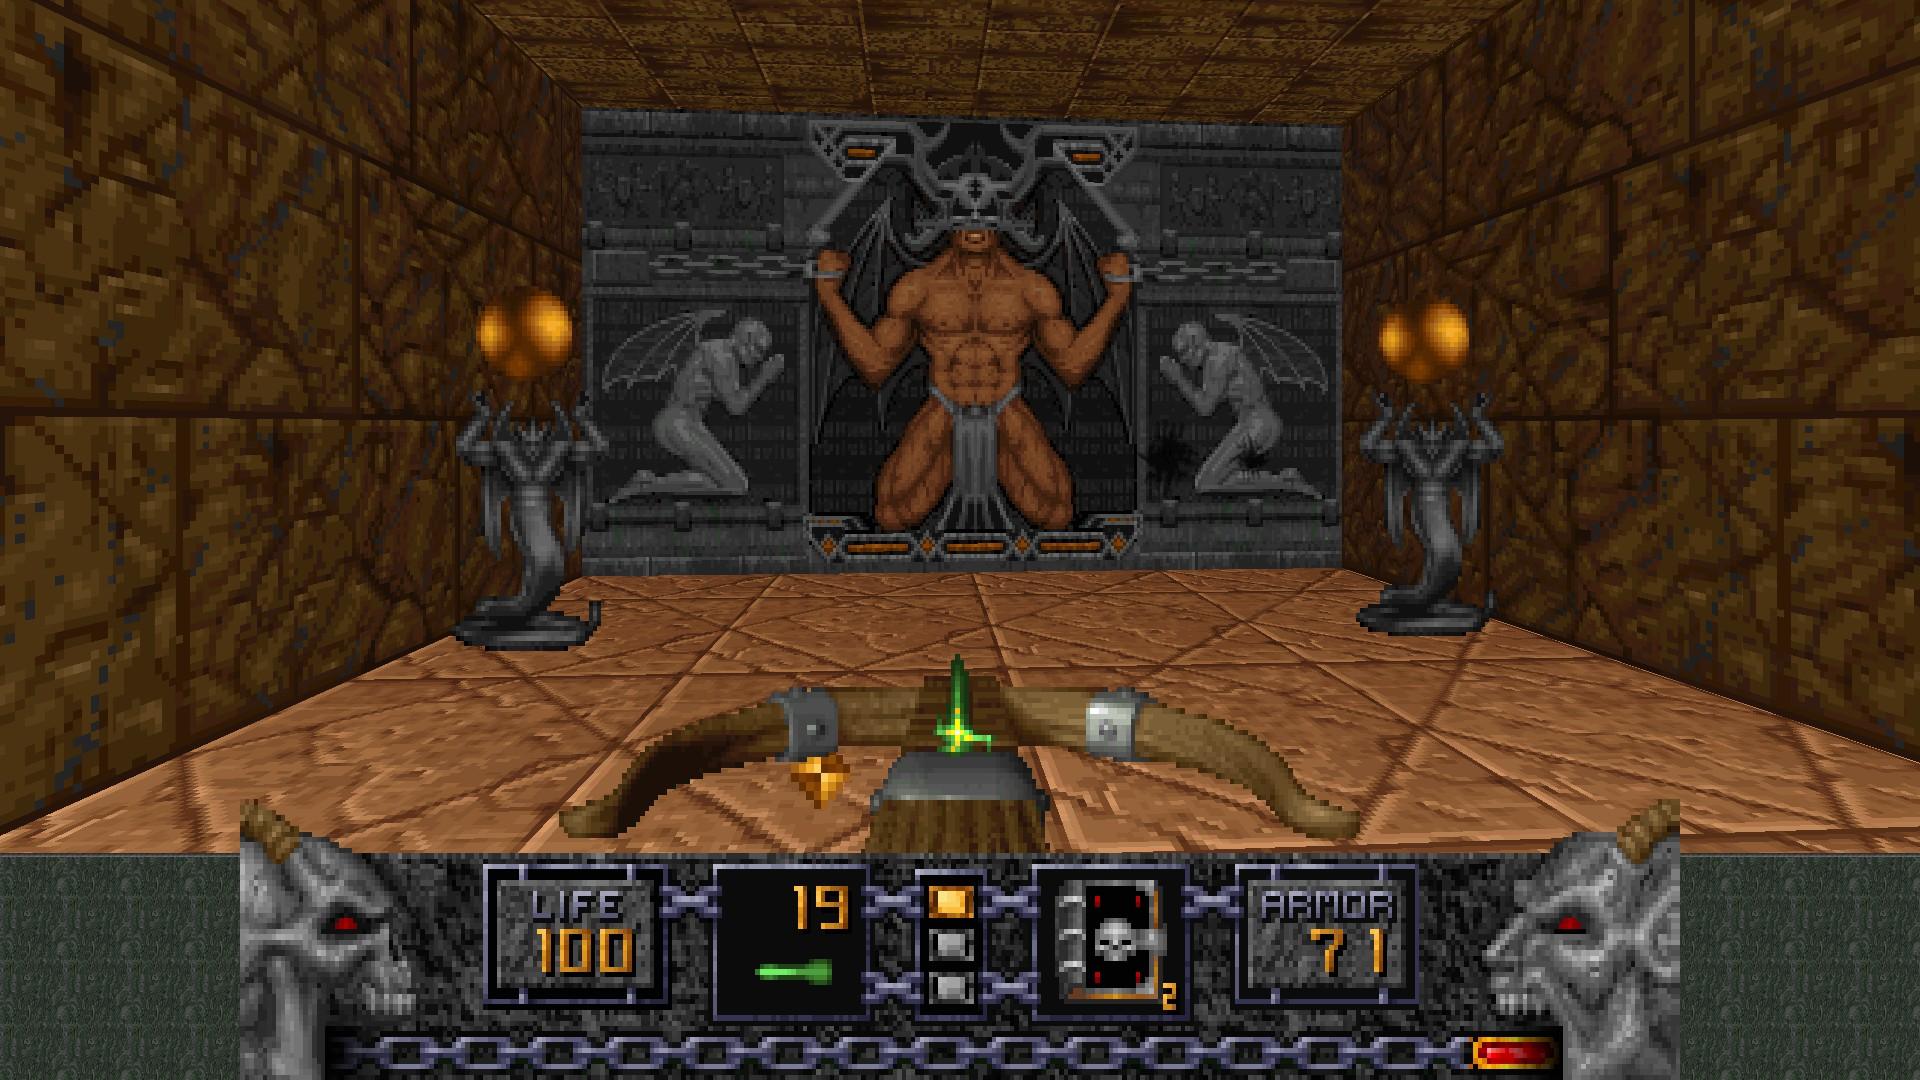 Heretic 1994